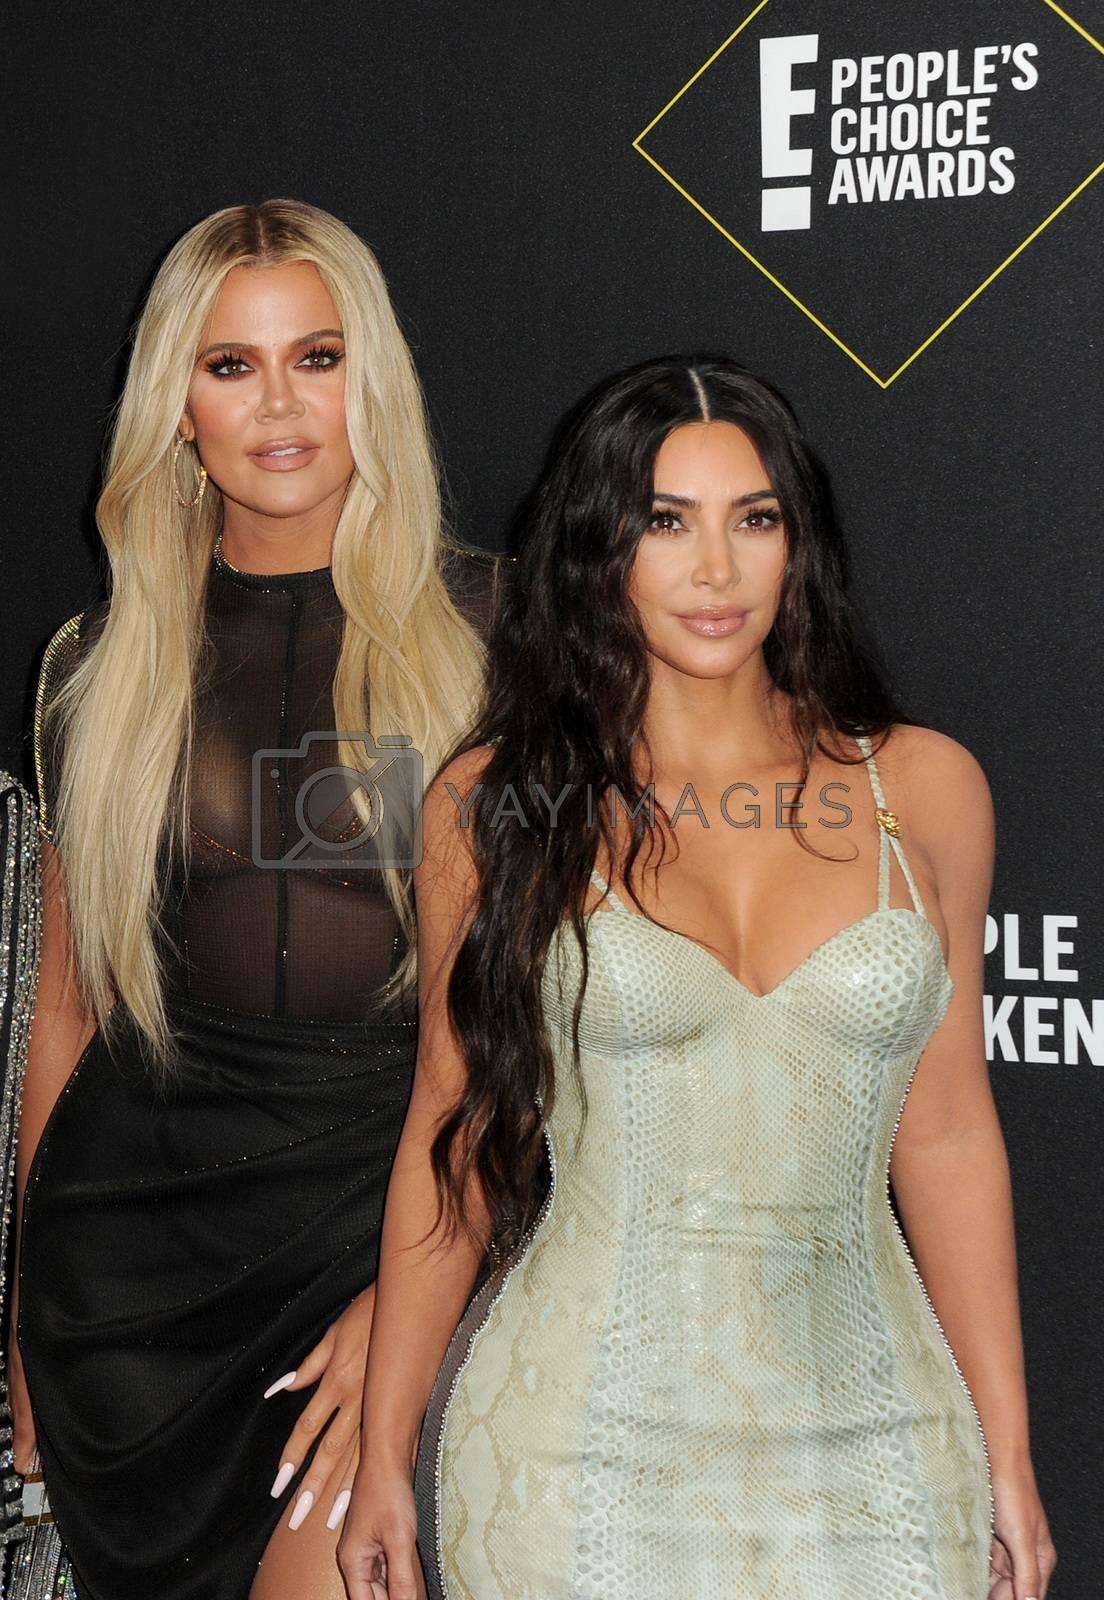 Royalty free image of Kim Kardashian and Khloe Kardashian by Lumeimages